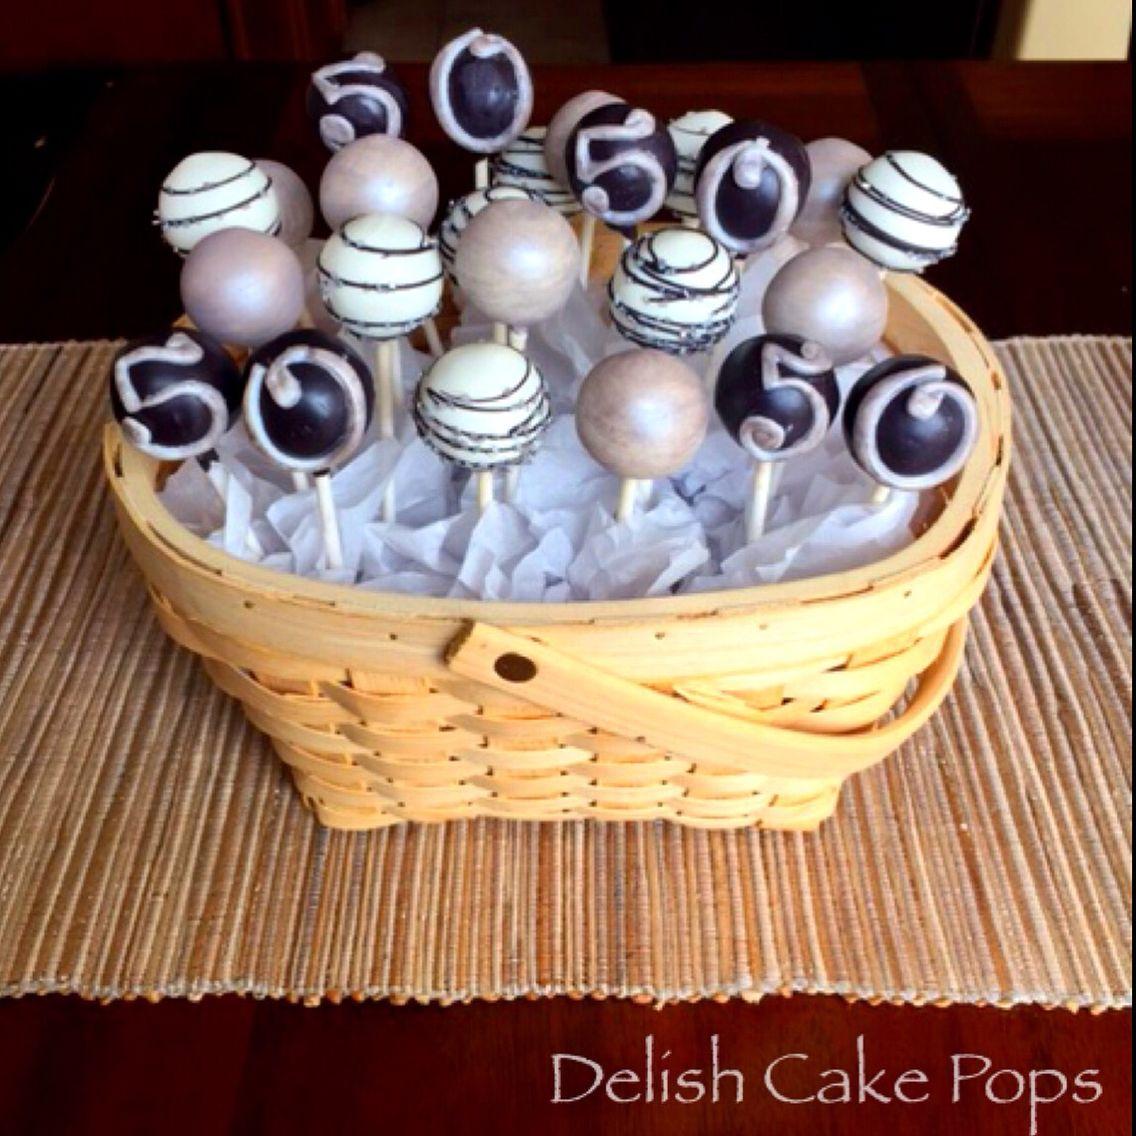 Astounding 50Th Birthday Cake Pops From Facebook Com Delish Cakepops Funny Birthday Cards Online Inifodamsfinfo